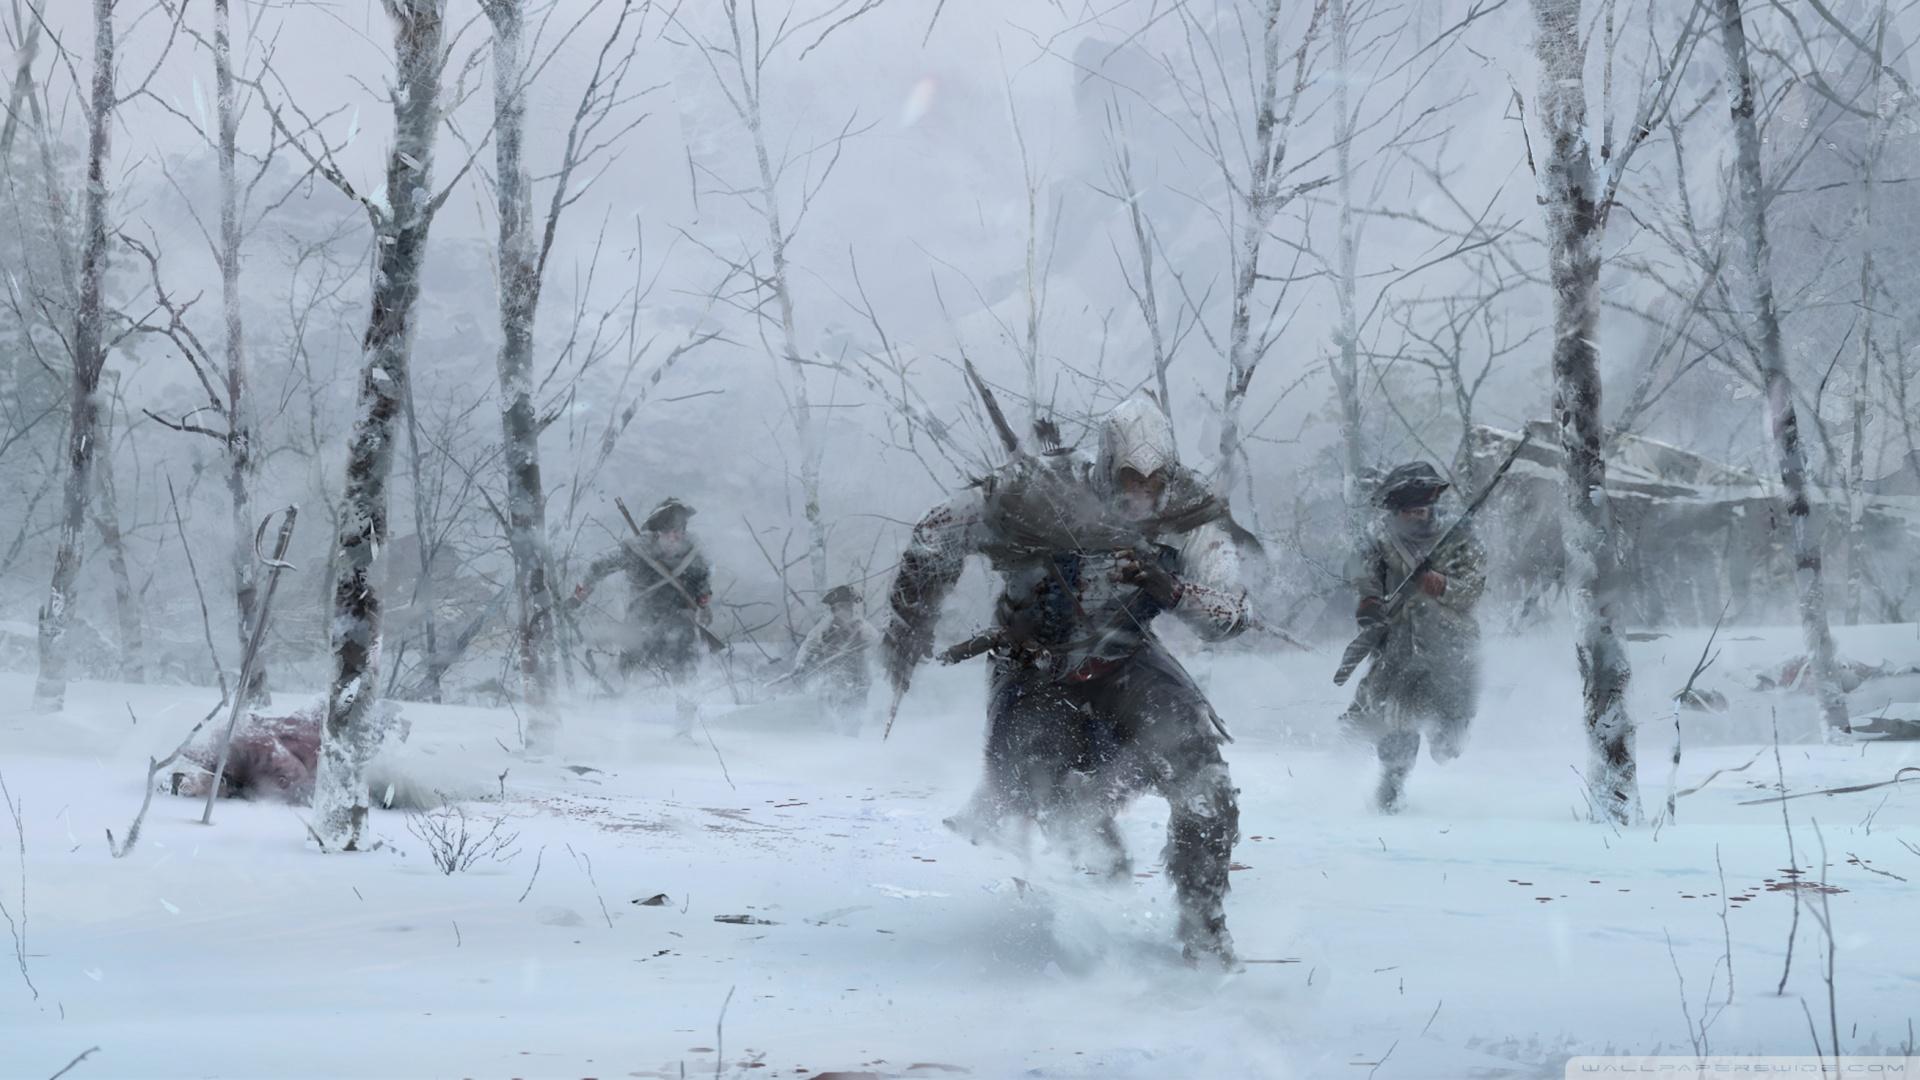 assassins creed iii winter wallpaper 1920x1080   assassins creed iii 1920x1080